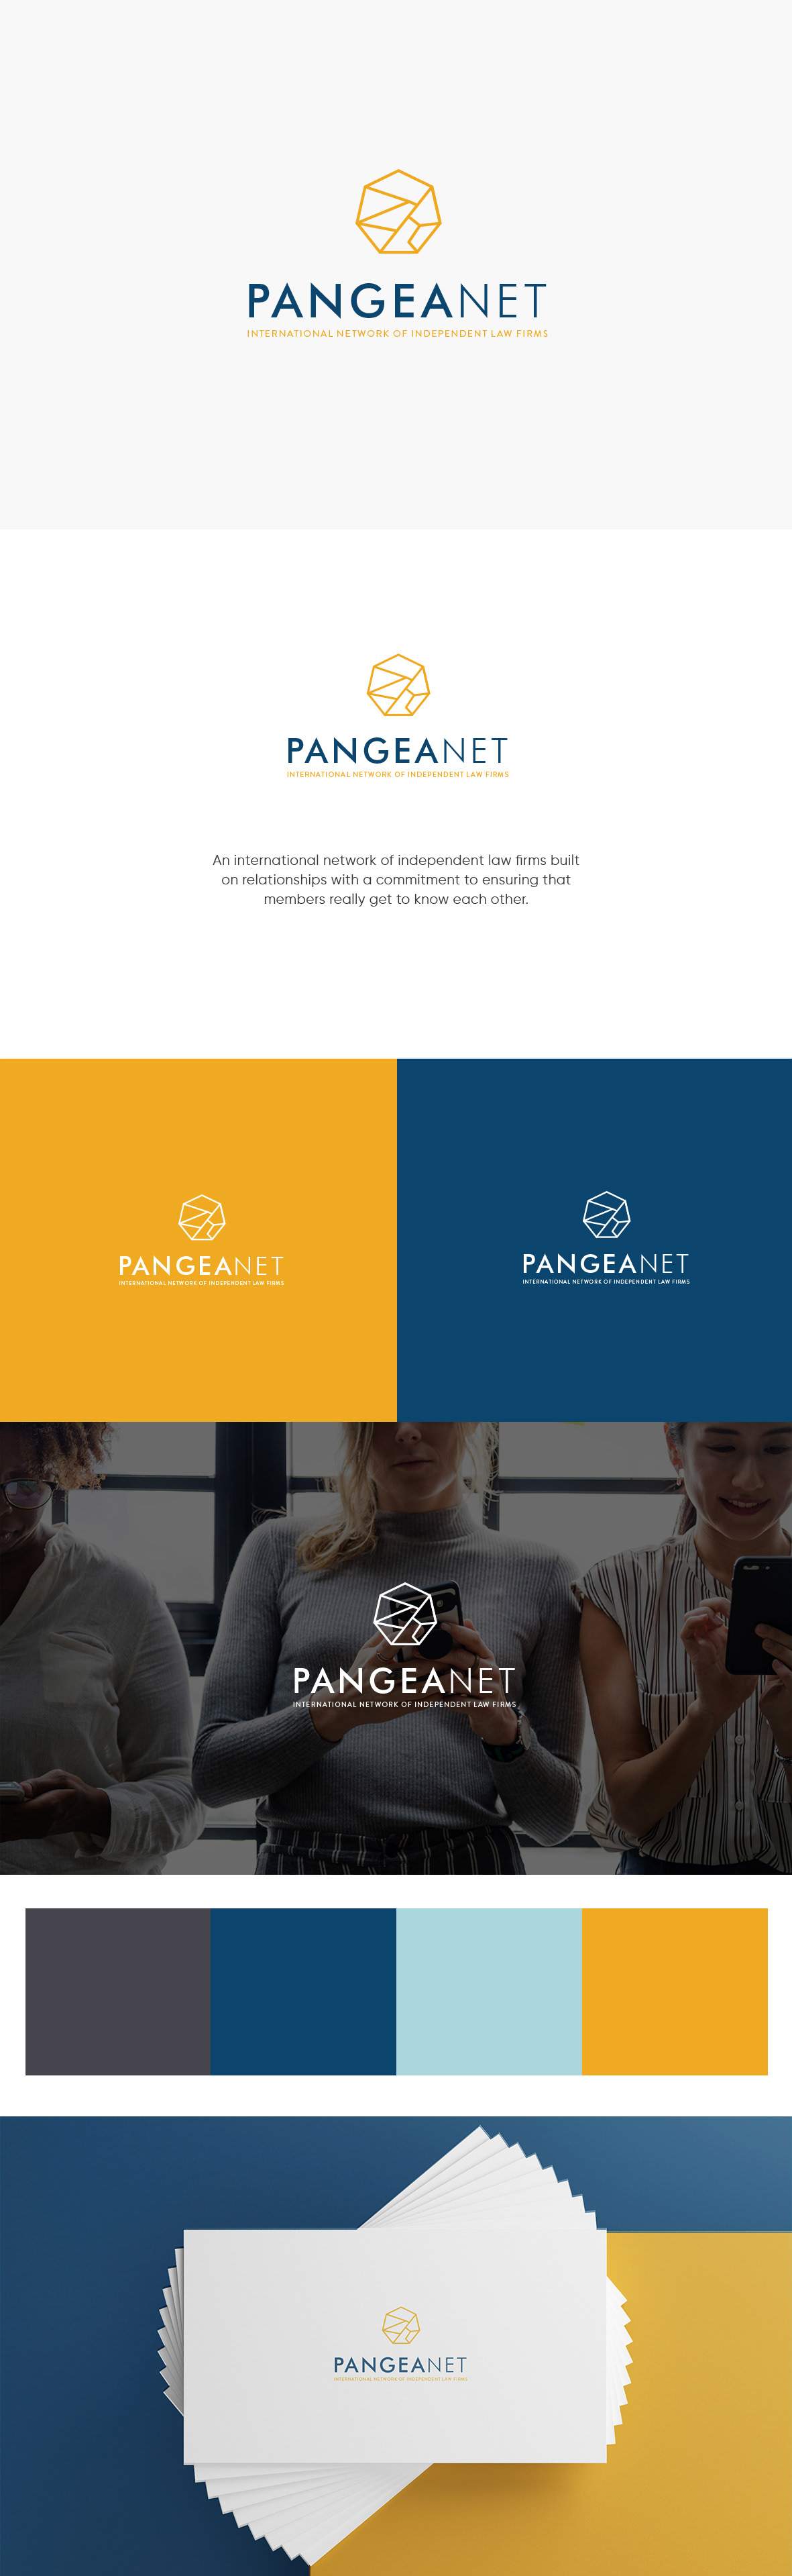 branding  Logo Design law firm legal corporate pangea Brand Design Corporate Identity corporate guidelines visual language